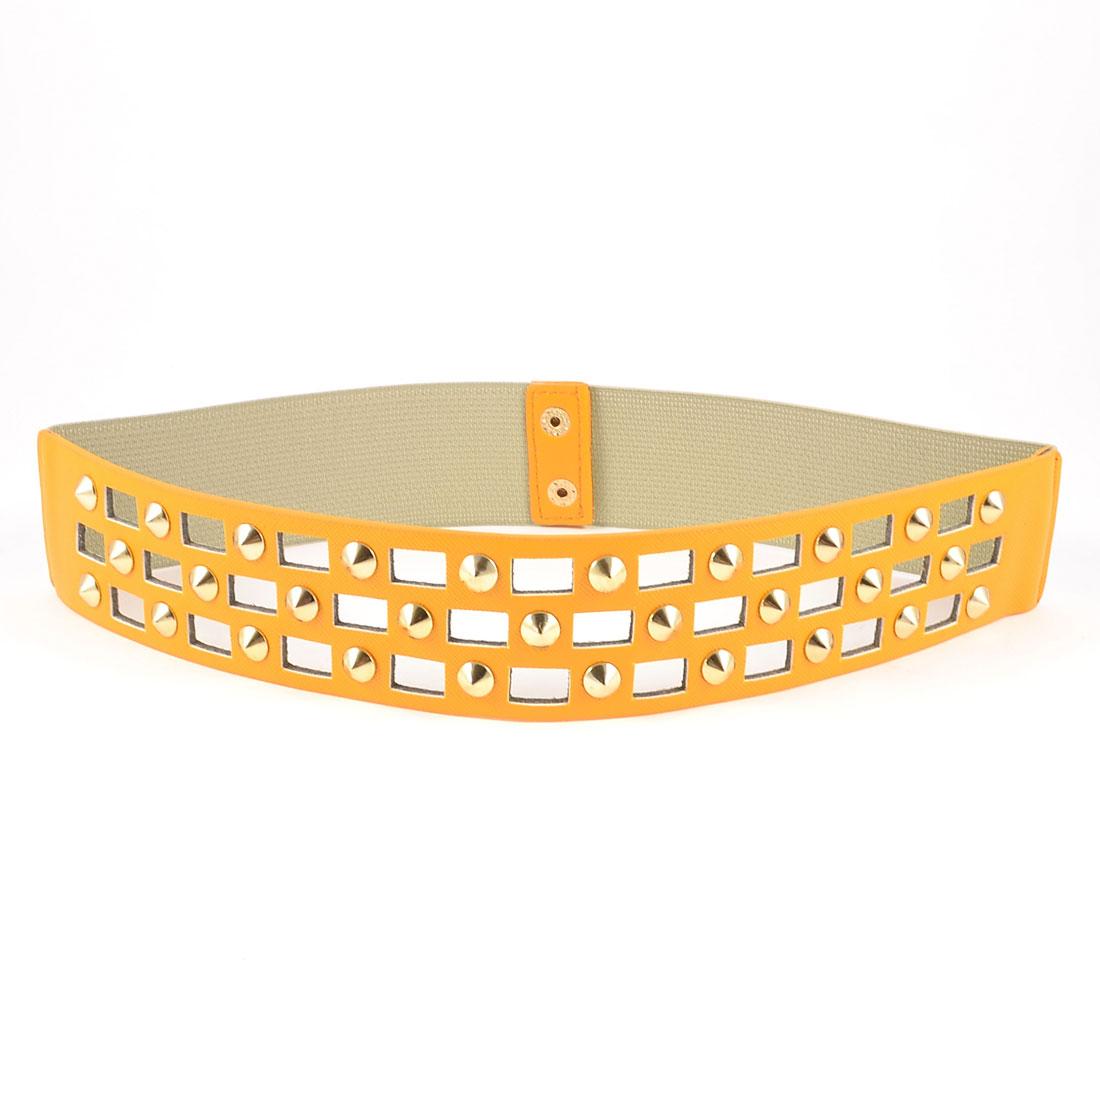 Lady Metal Buckle Crocodile Pattern Nail Decoration Stretch Cinch Belt Orange